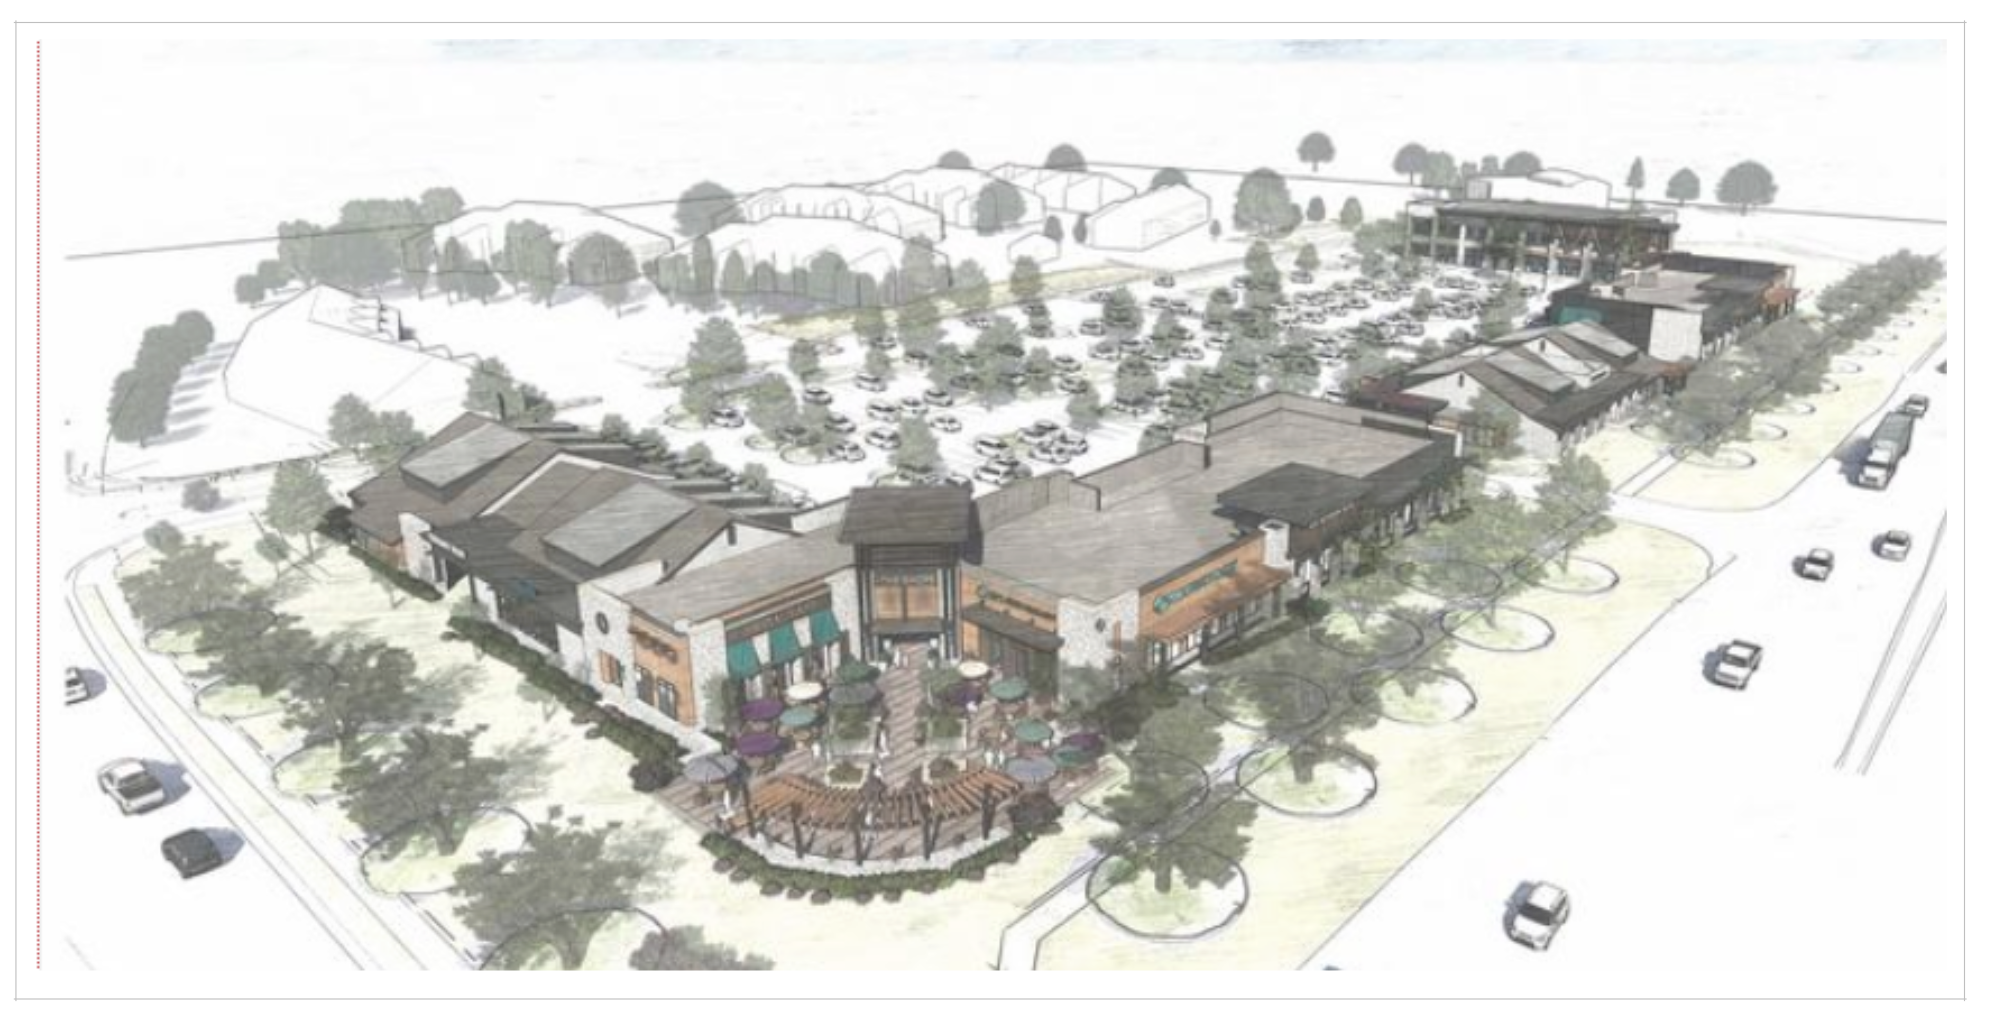 Birkdale Village South rendering